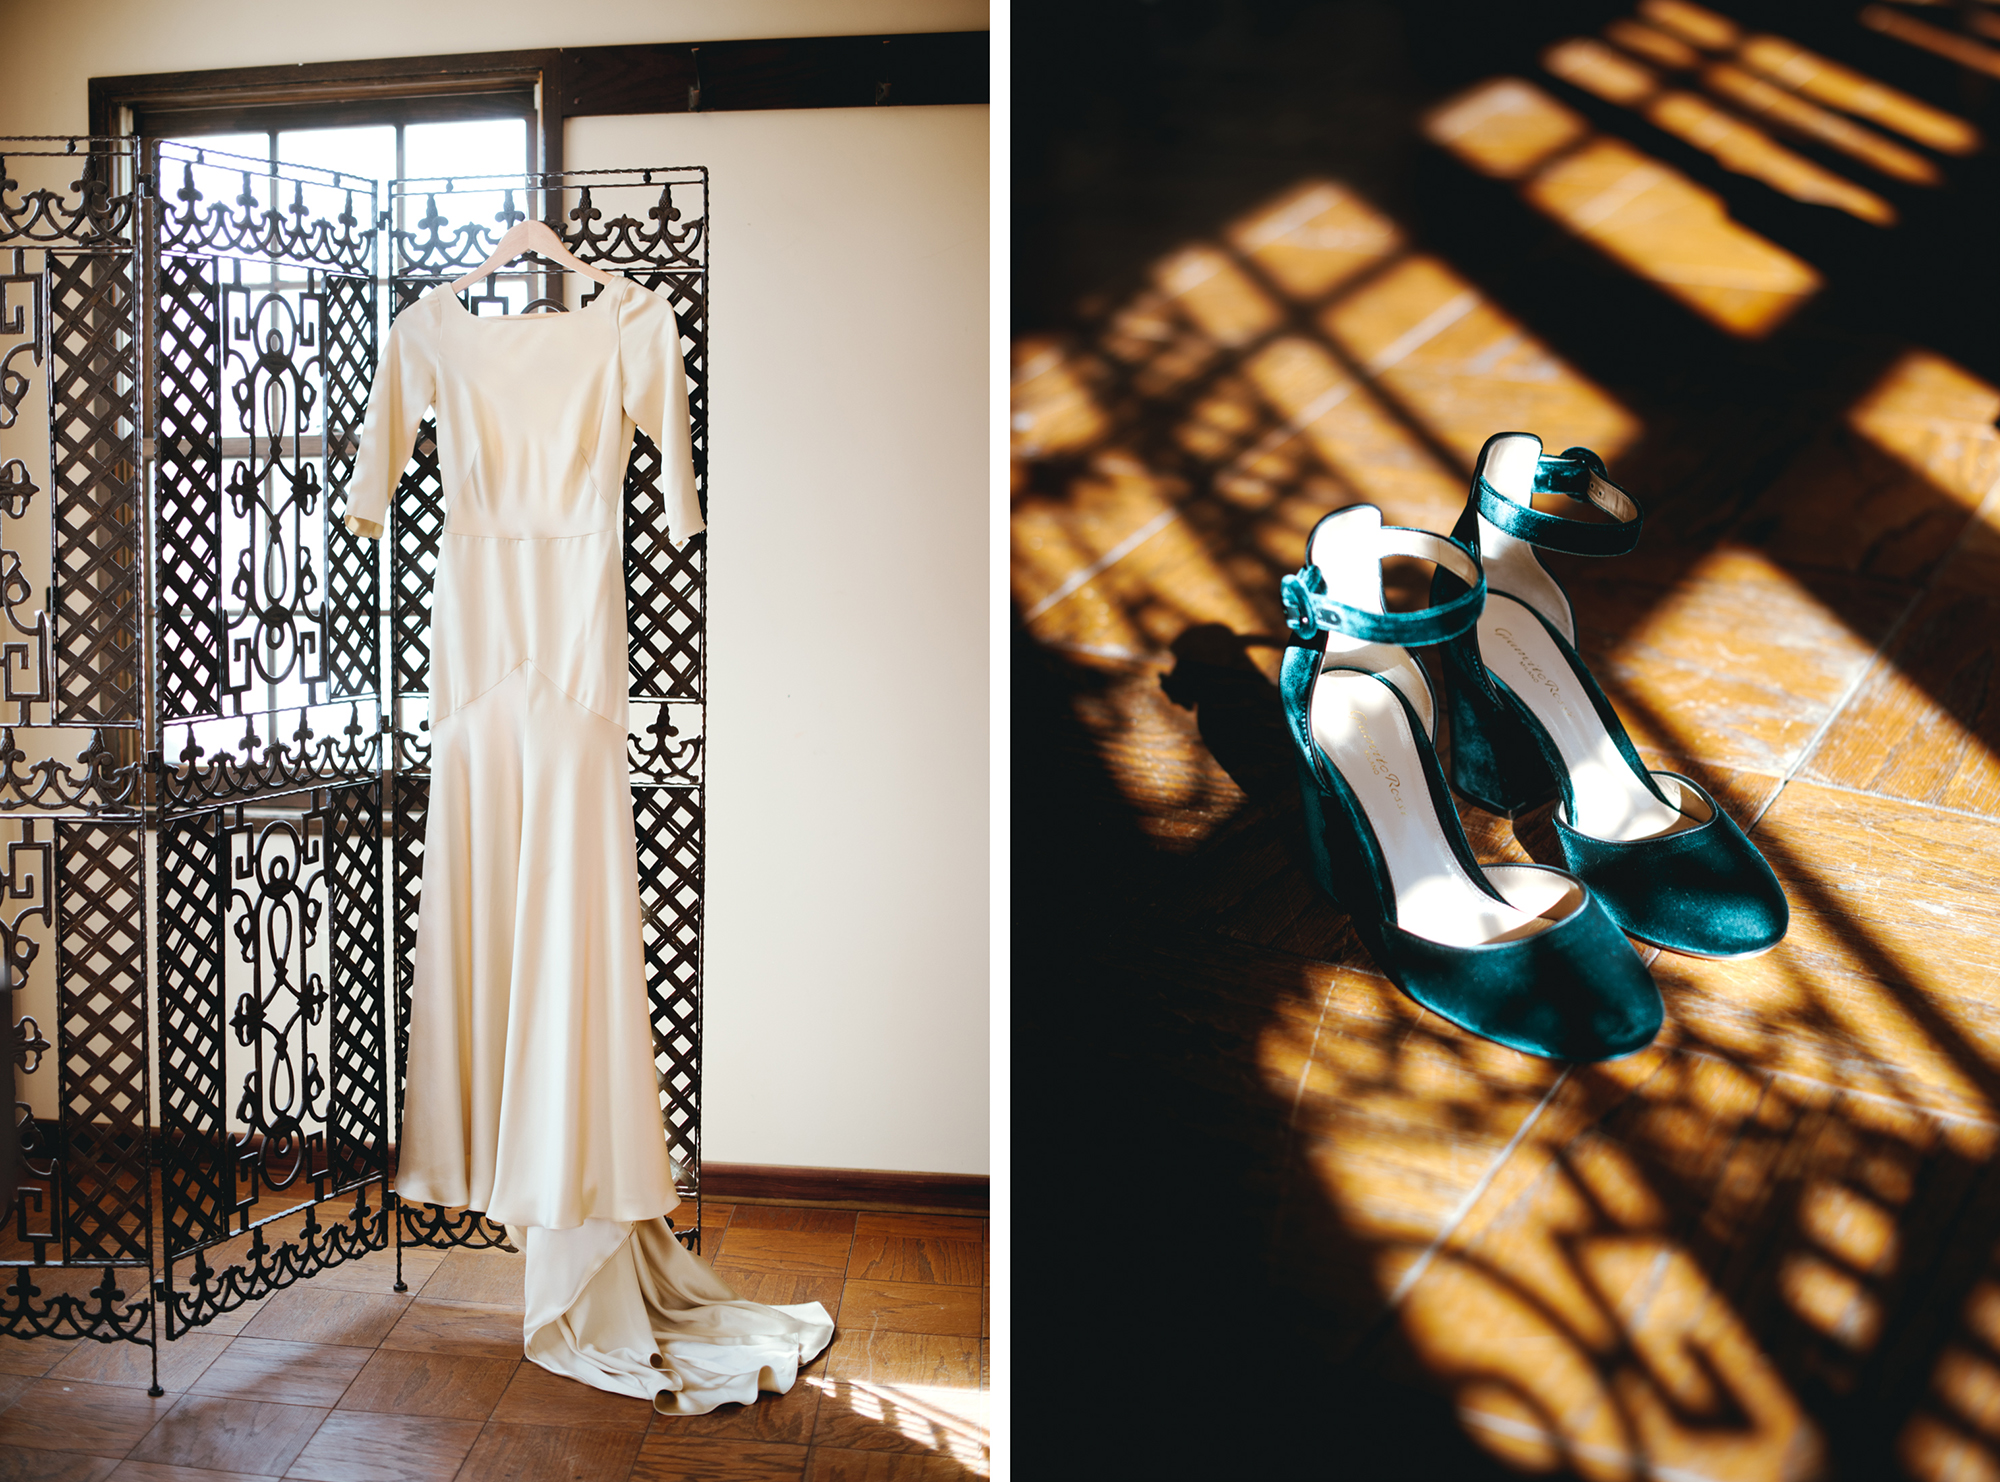 Hotel-du-village-wedding-winter-february-peaberry-photography-philadelphia-photographer-004.jpg